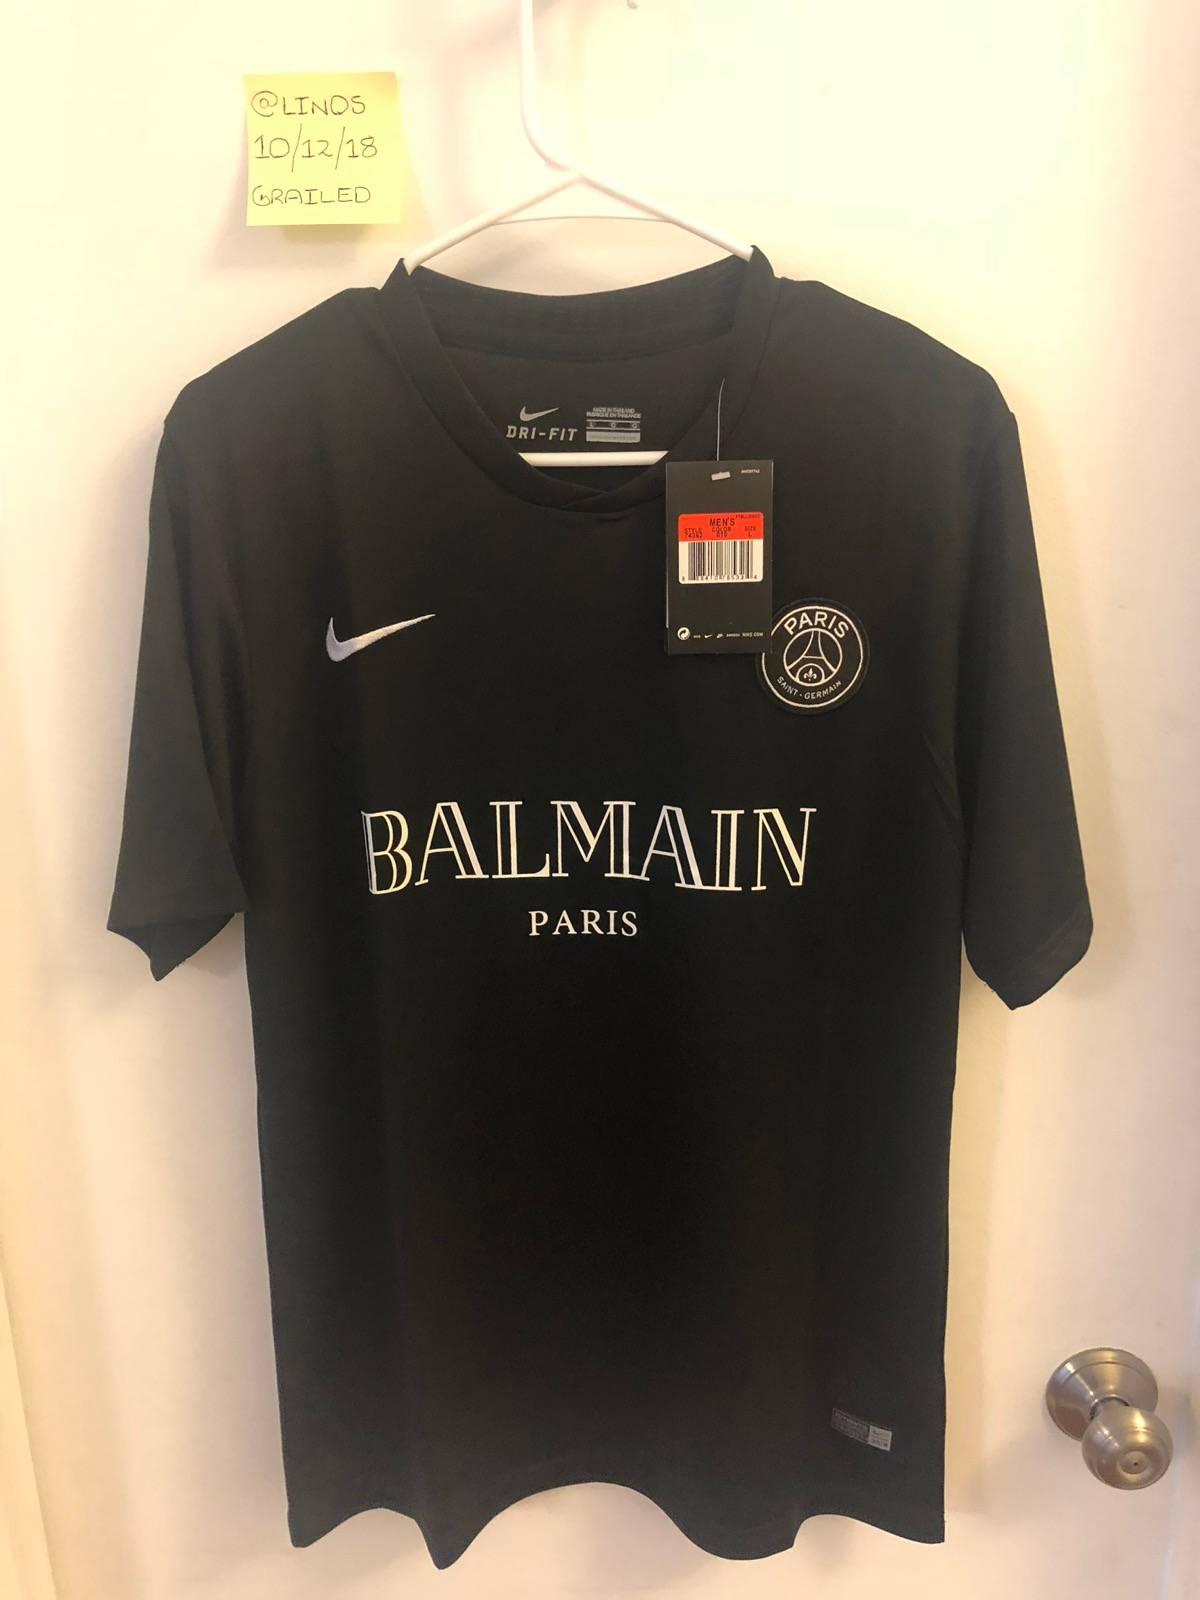 Kylian mbappe ended a four. Balmain Nike X Balmain X Psg Custom Mens Soccer Jersey